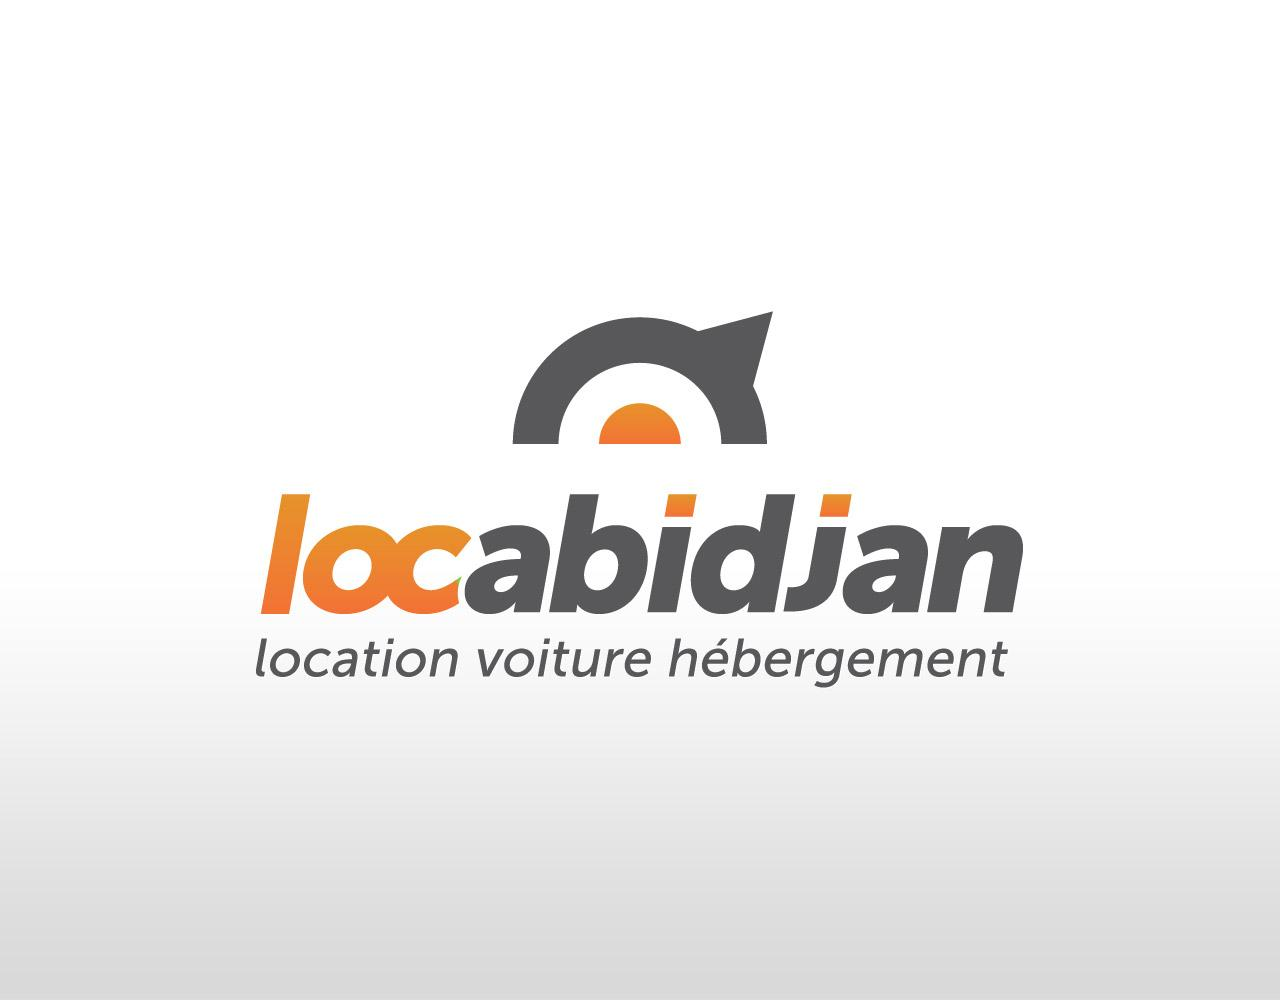 locabidjan-creation-logo-identite-visuelle-charte-graphique-caconcept-alexis-cretin-1